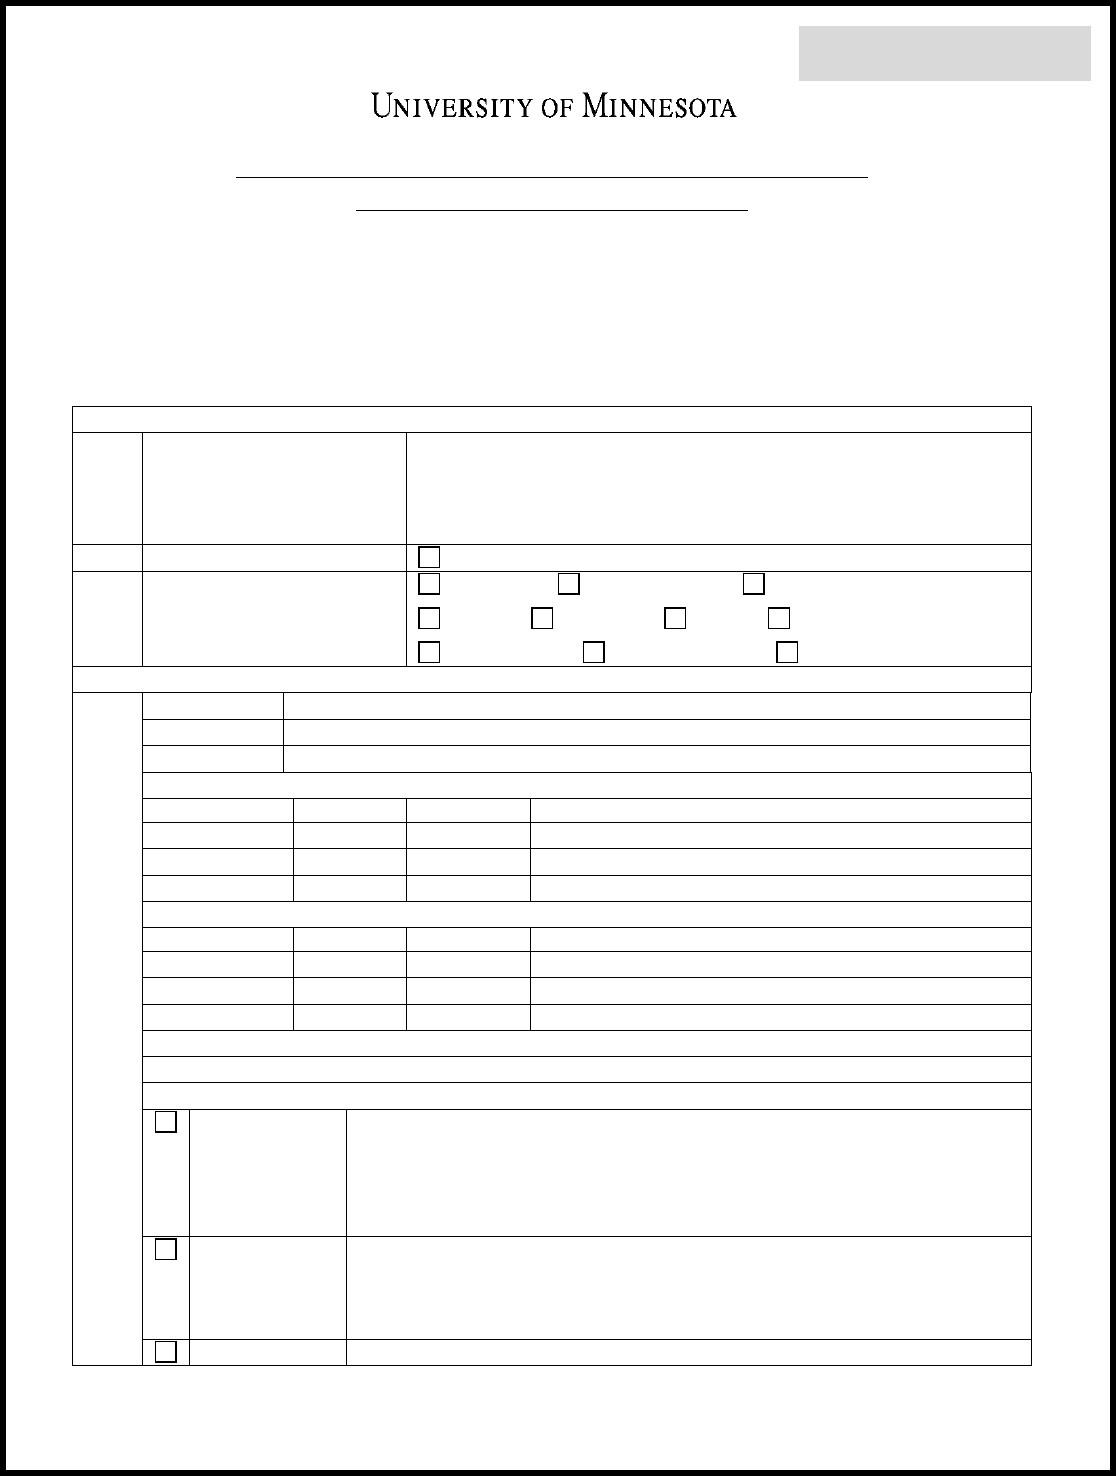 Term Sheet Template Word Download Term Sheet Template Word for Free Tidytemplates